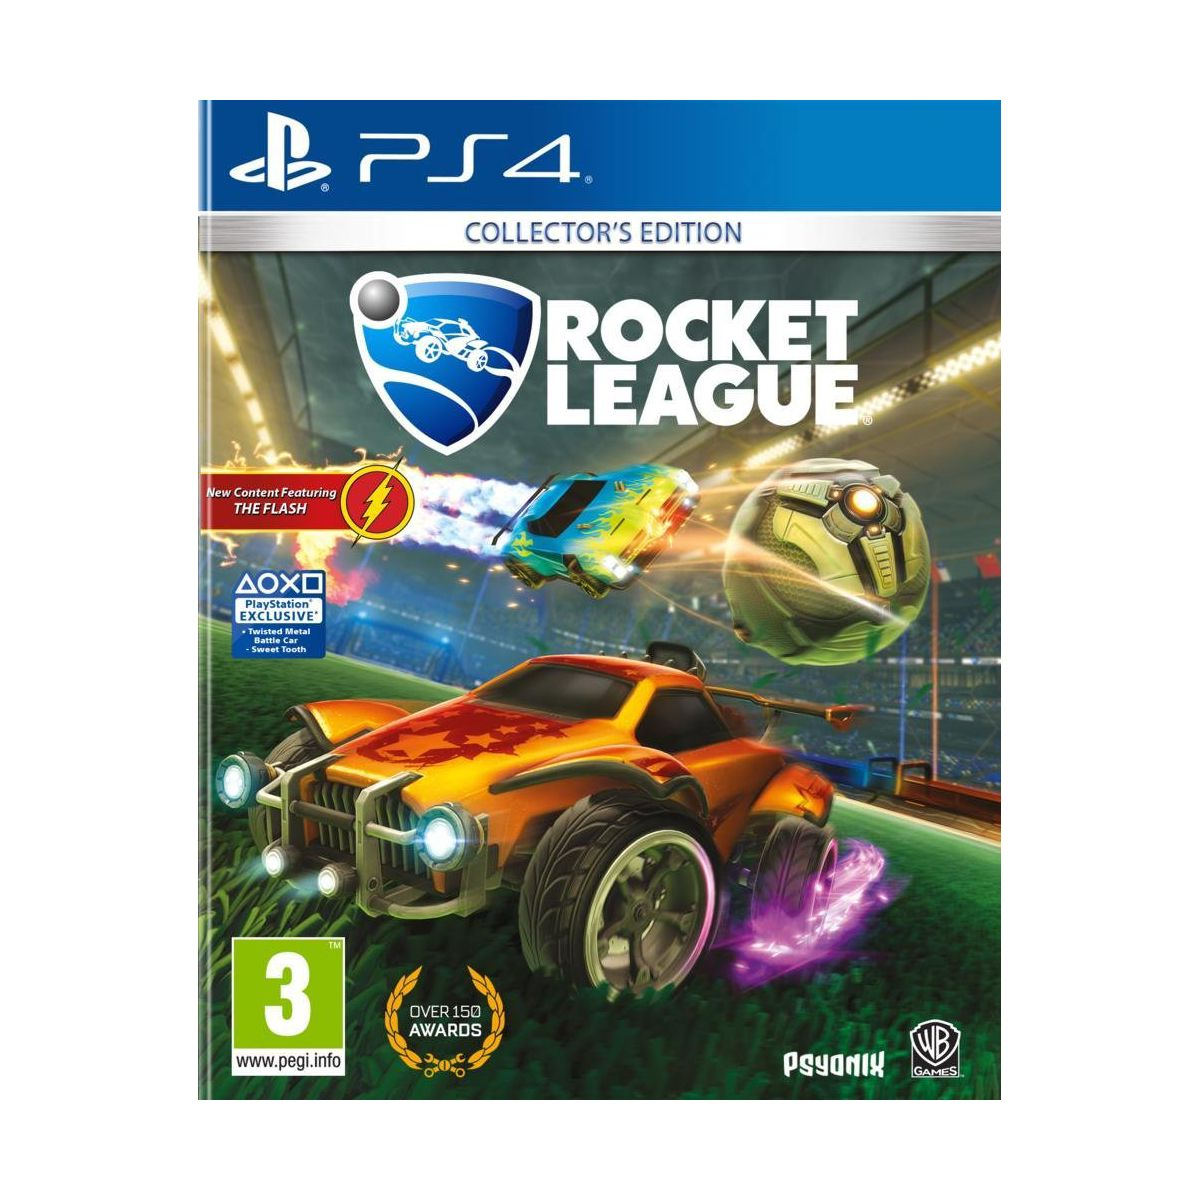 Jeu PS4 WARNER Rocket League Collector's Edition